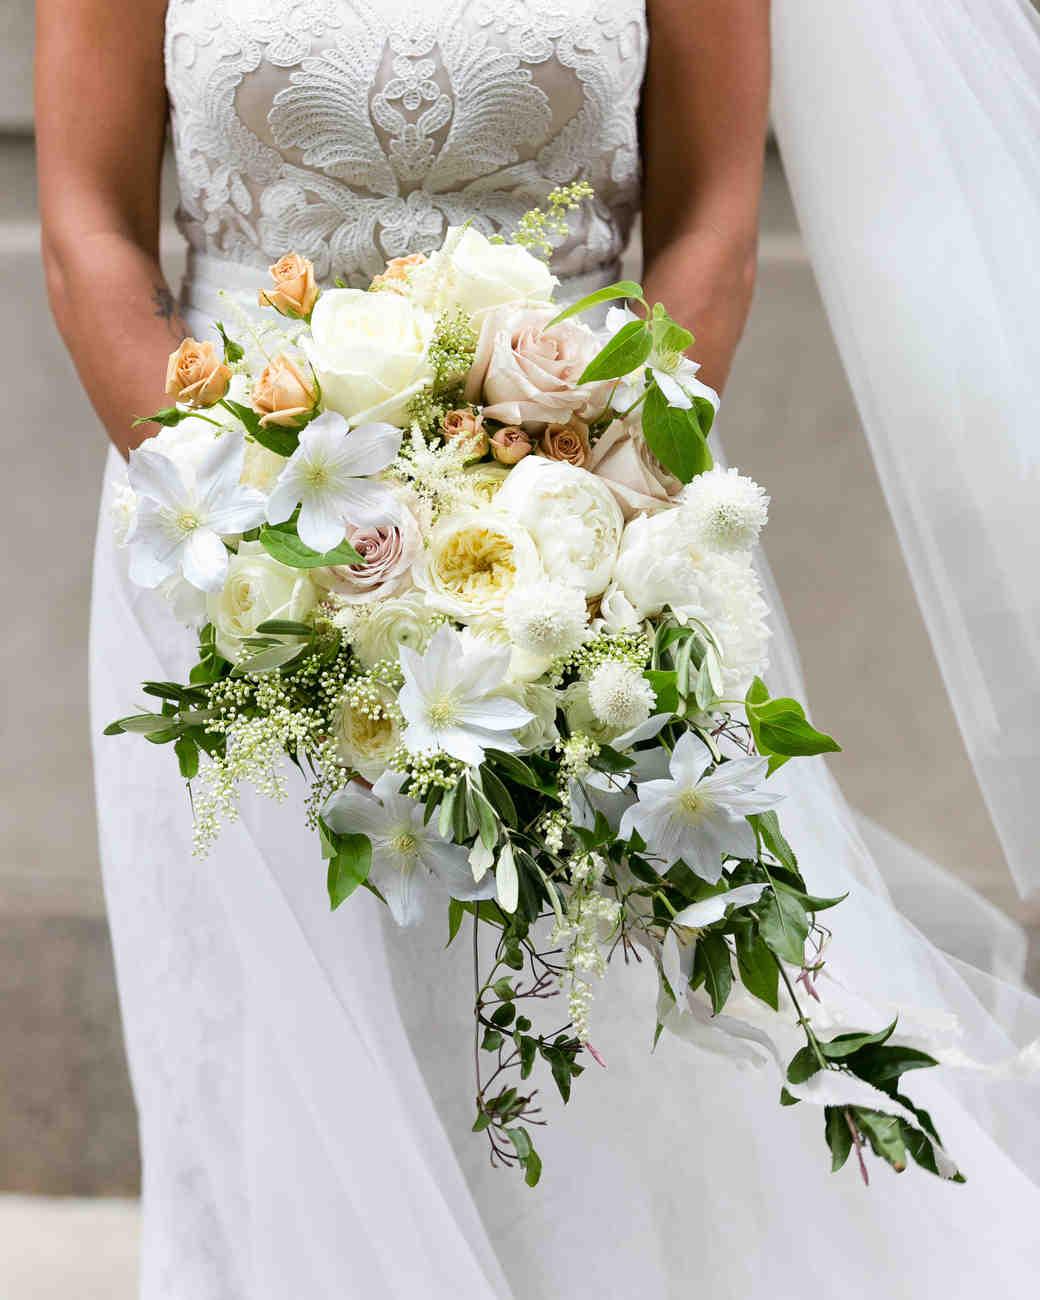 Bridal Bouquet Ideas For Fall Weddings Bridal Bouquet Ideas For